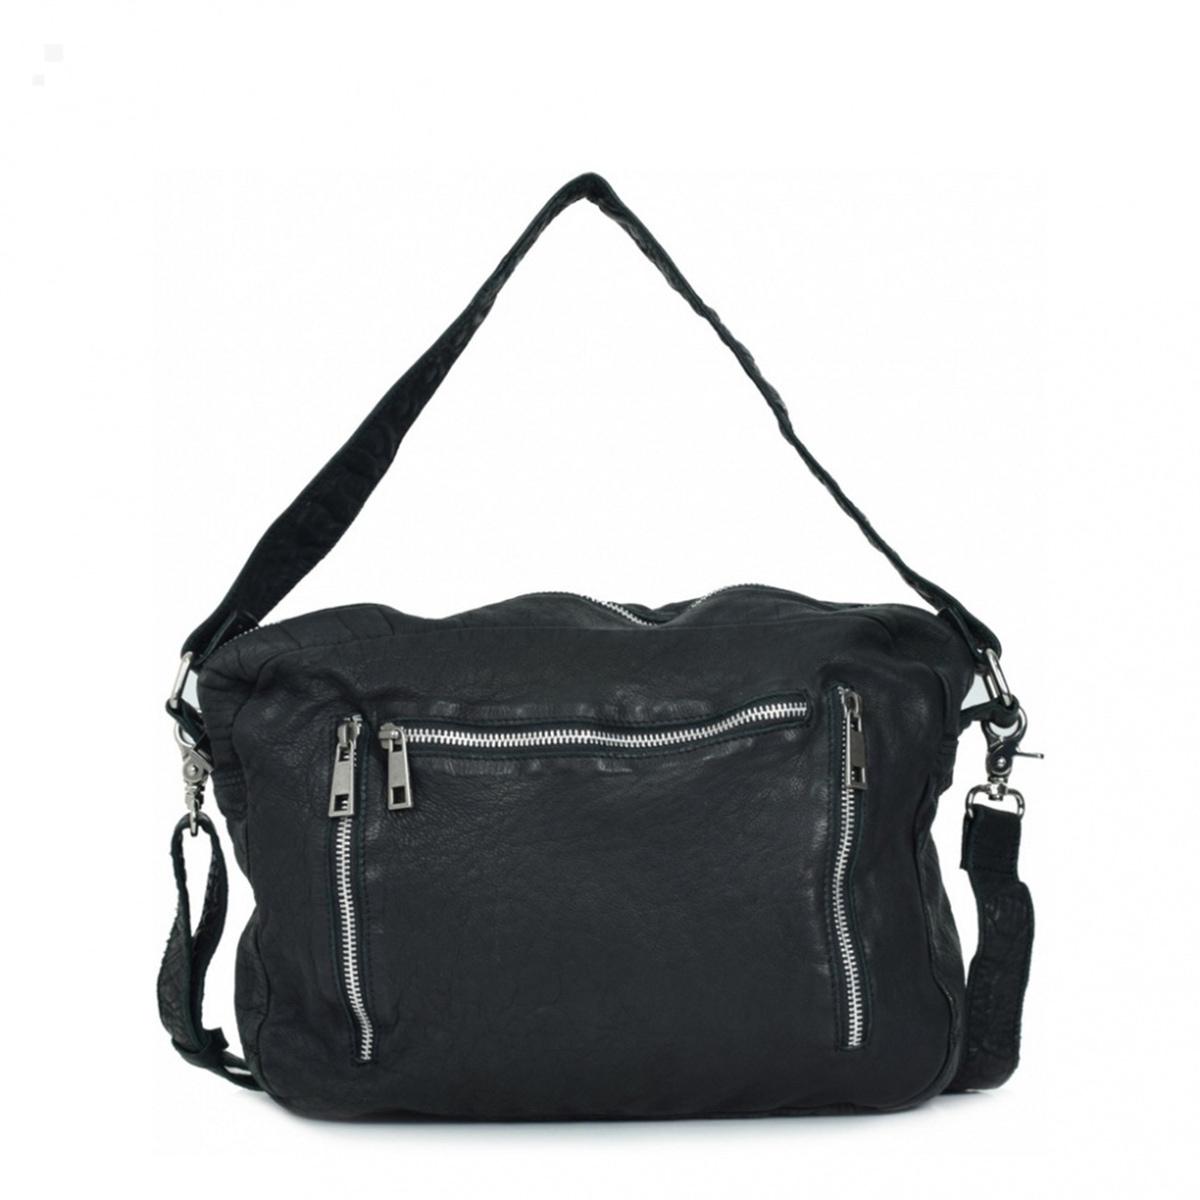 Núnoo Bag - Andrea Washed Black